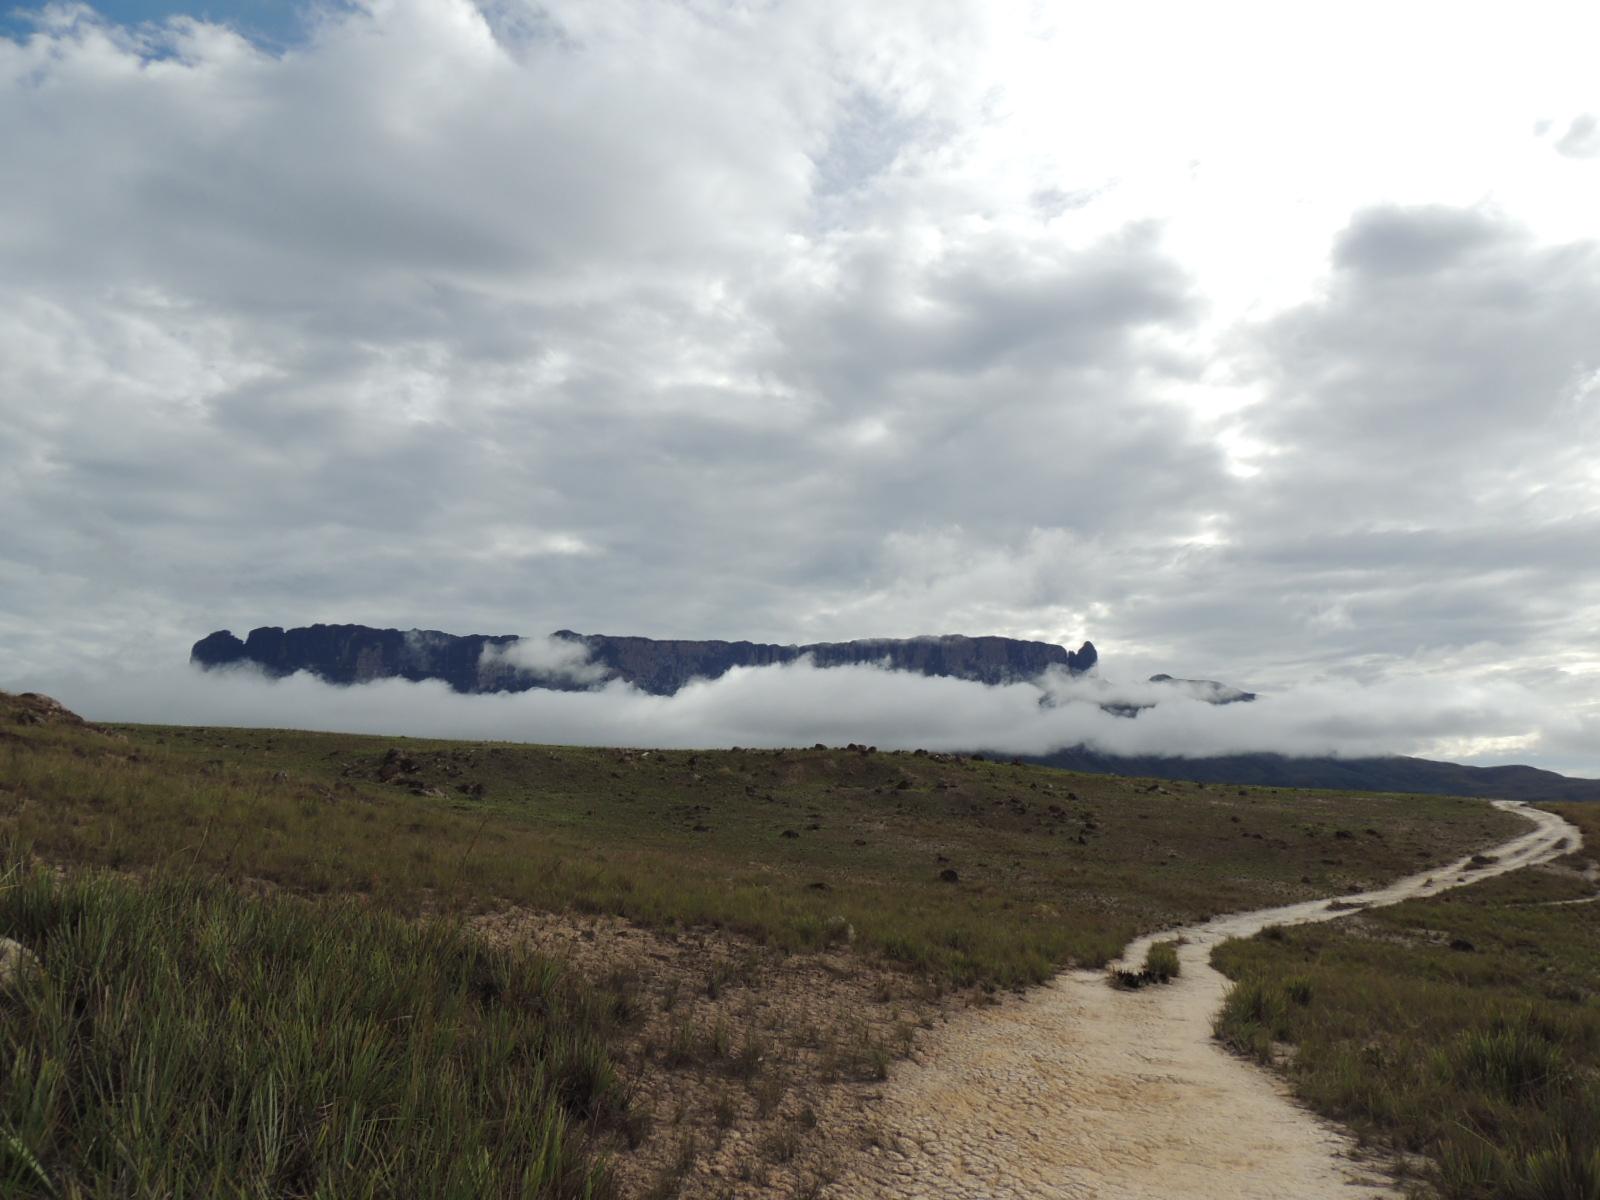 Trilha e Roraima entre nuvens.JPG